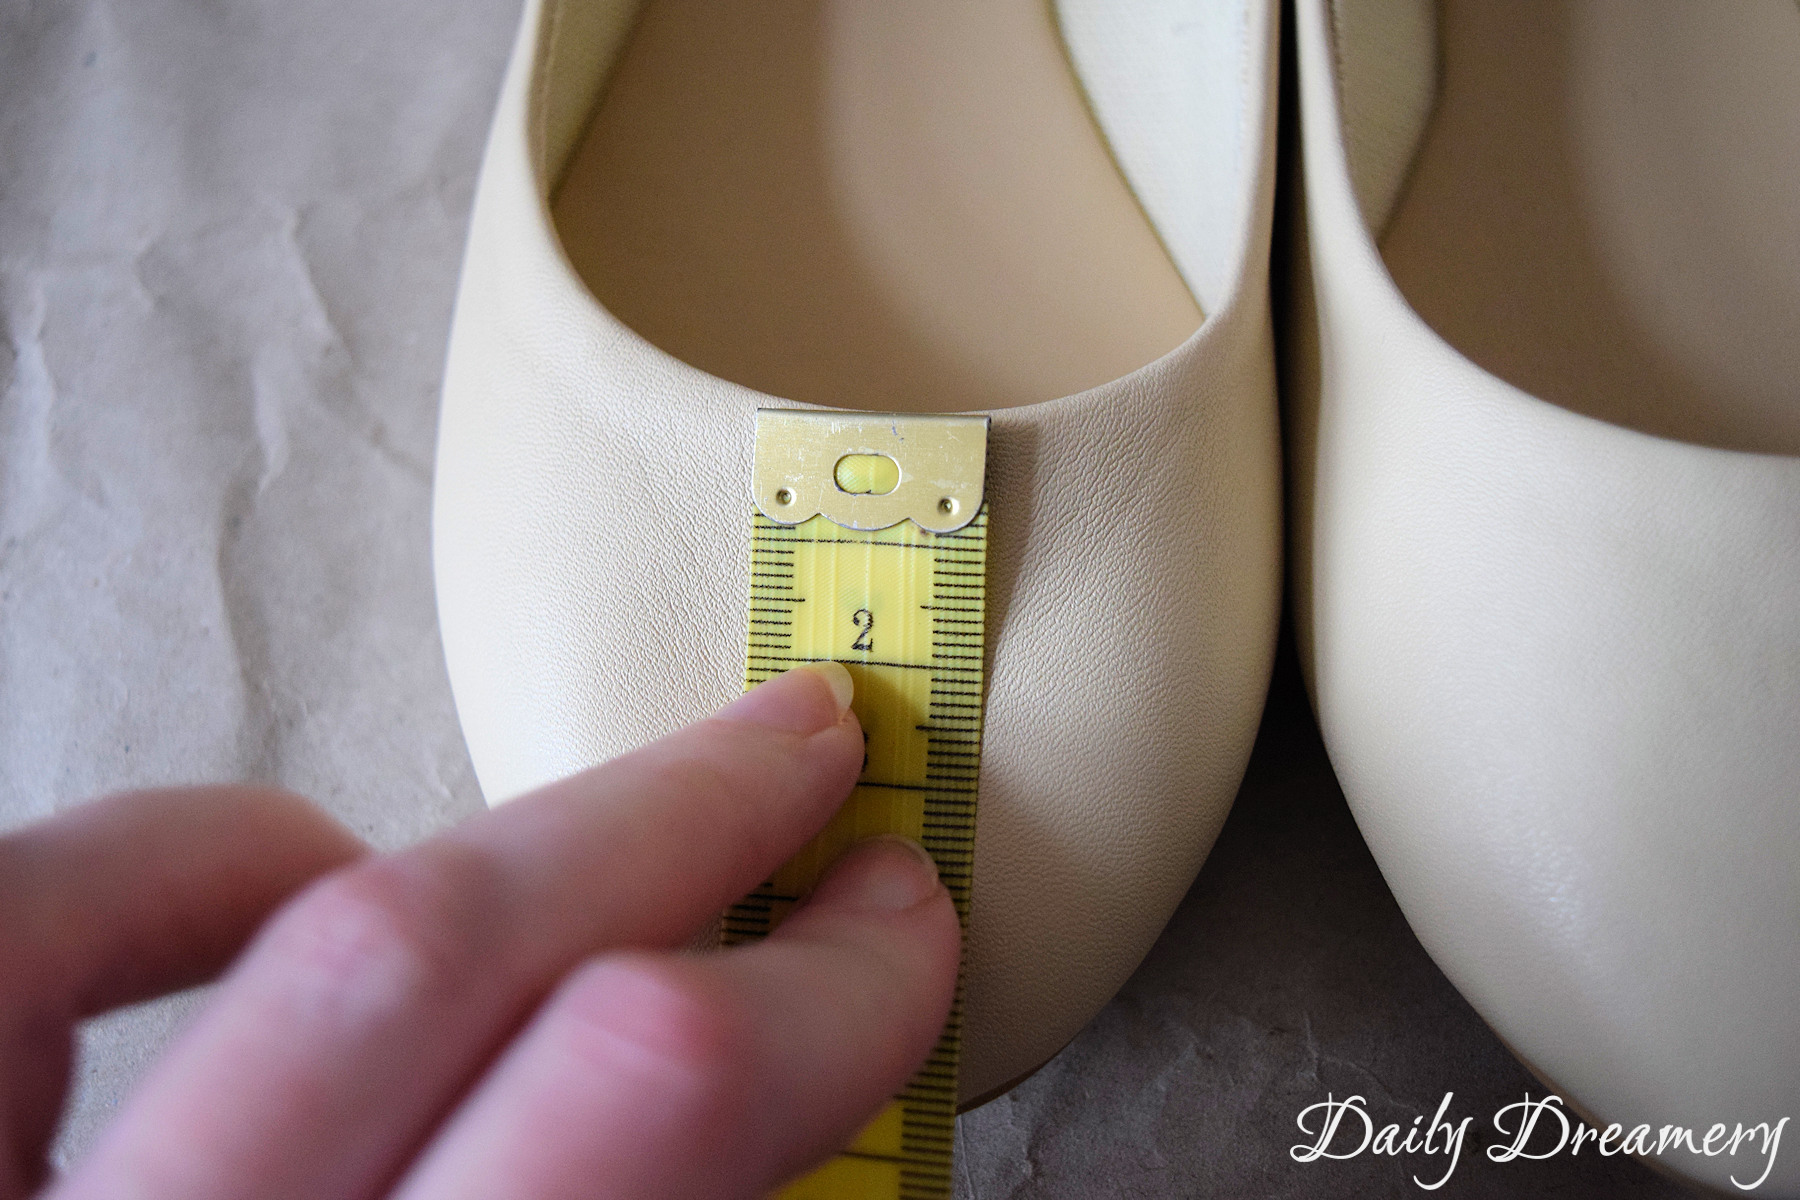 Mit Lederfarben Schuhe Bemalen Fur Echte Trend Schuhe Daily Dreamery